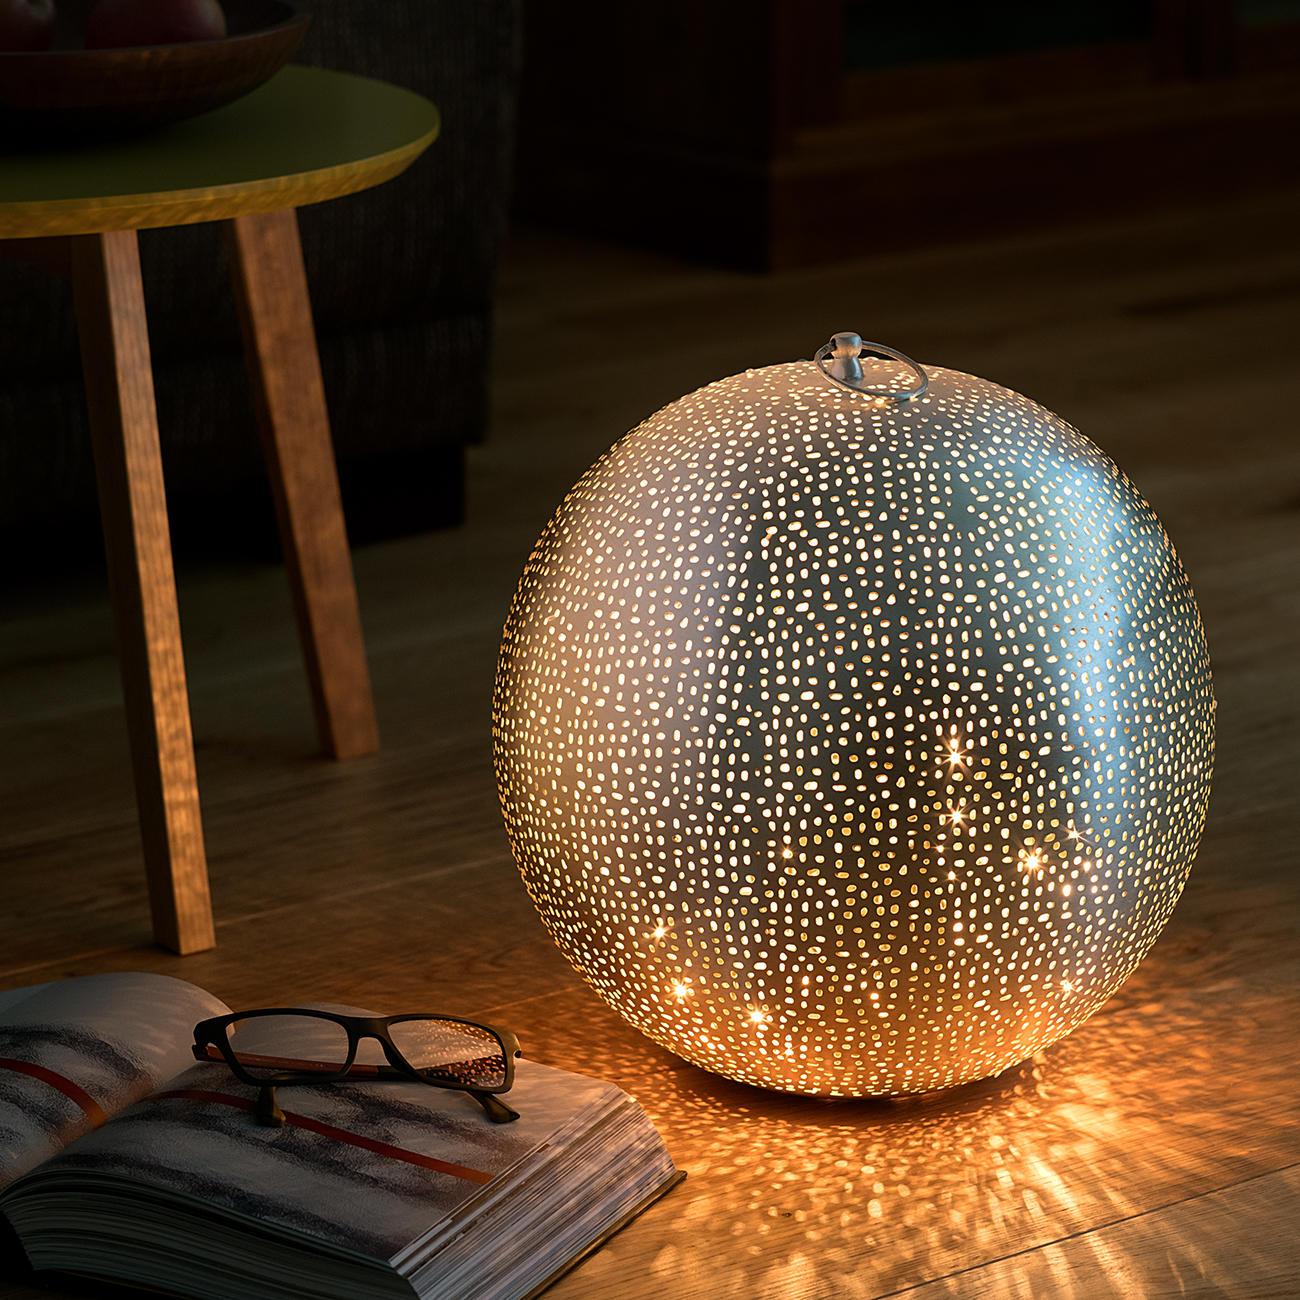 Oriental Globe Light 3 Year Product Guarantee